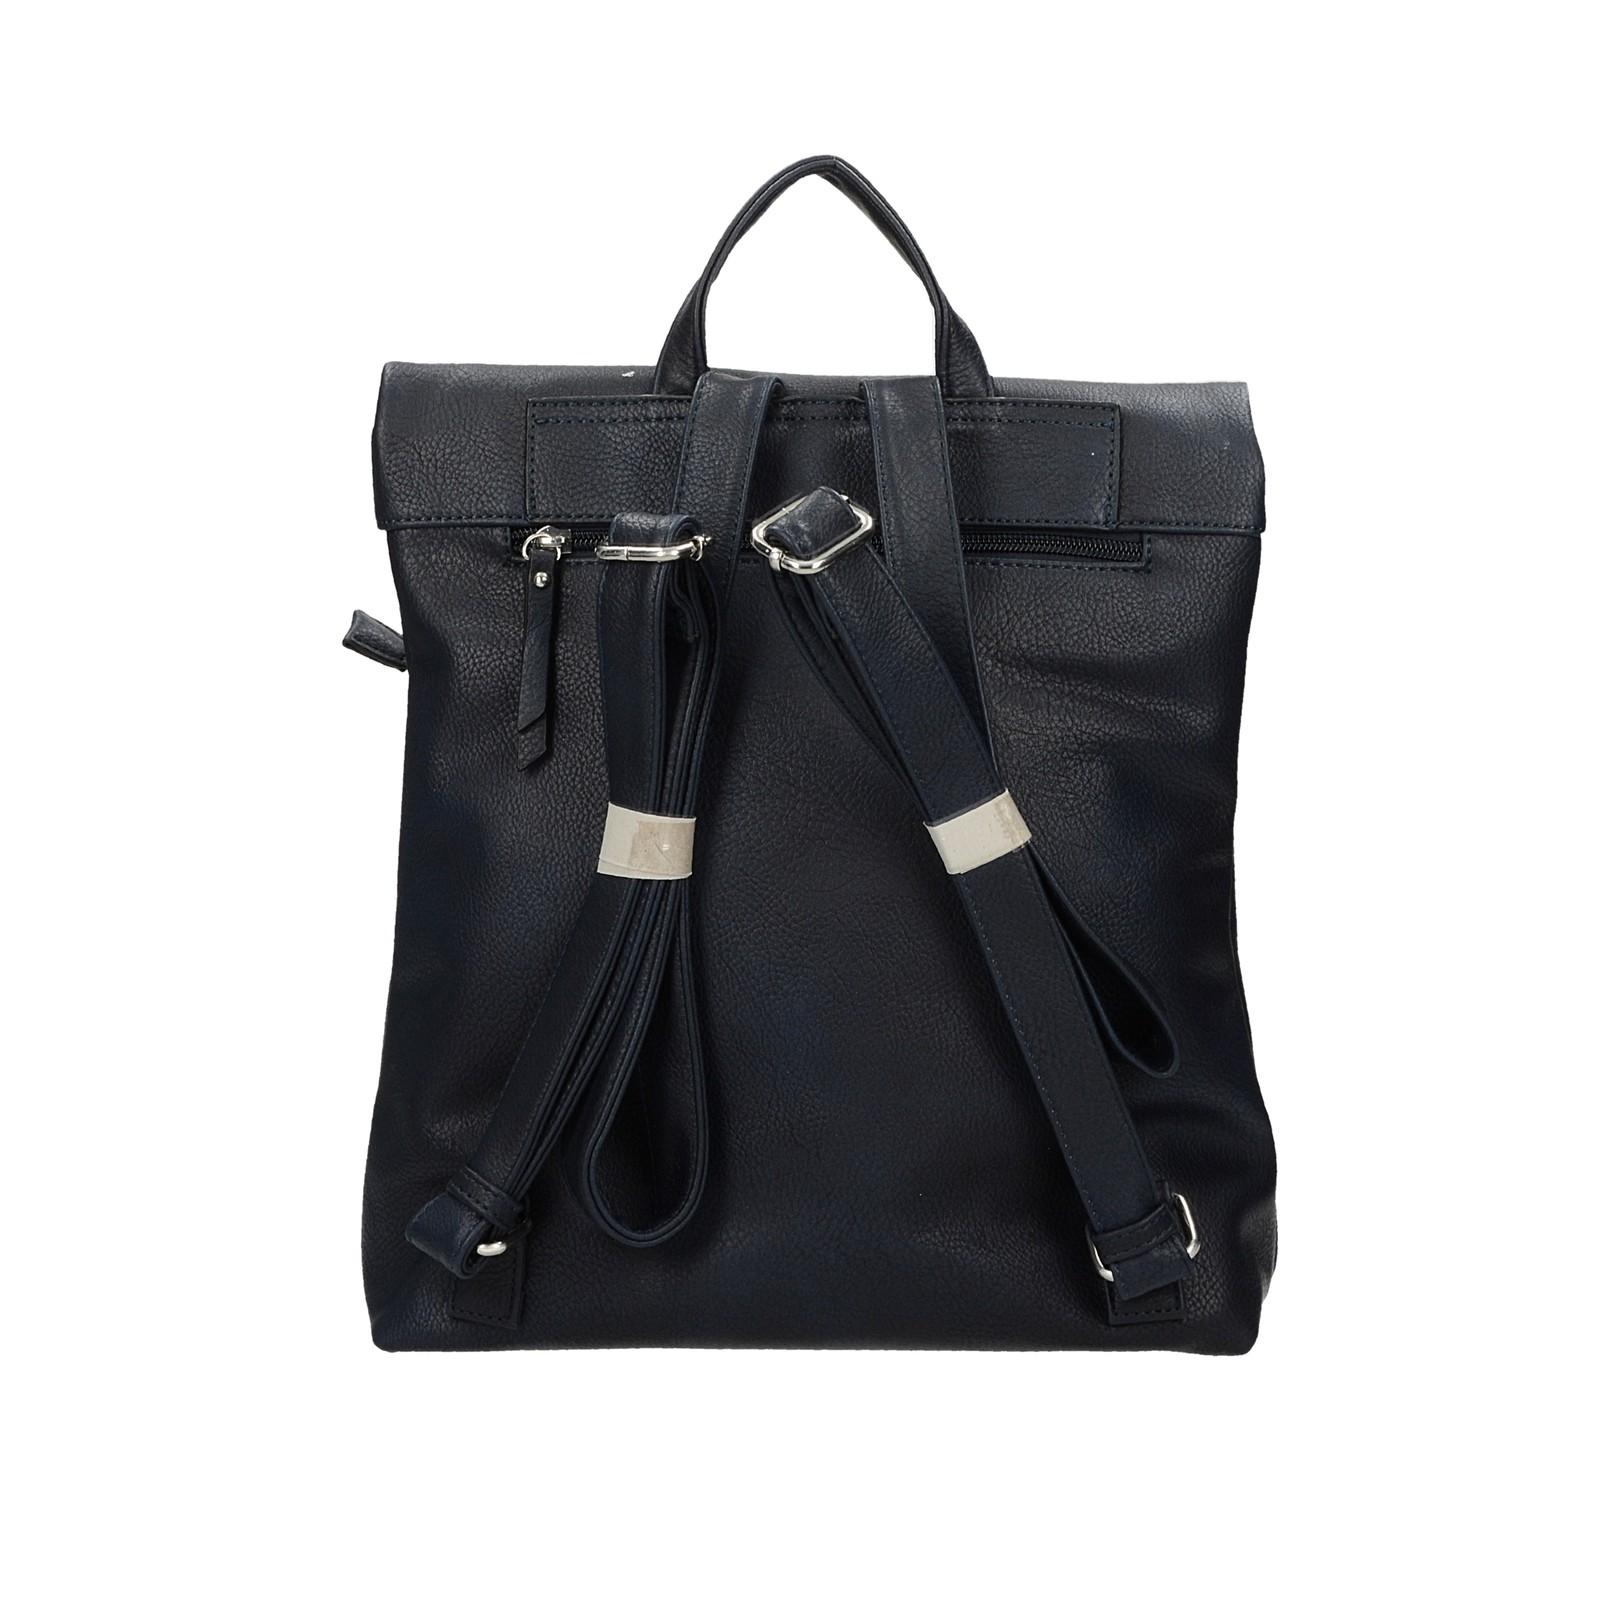 Gabor dámsky štýlový ruksak - tmavomodrý